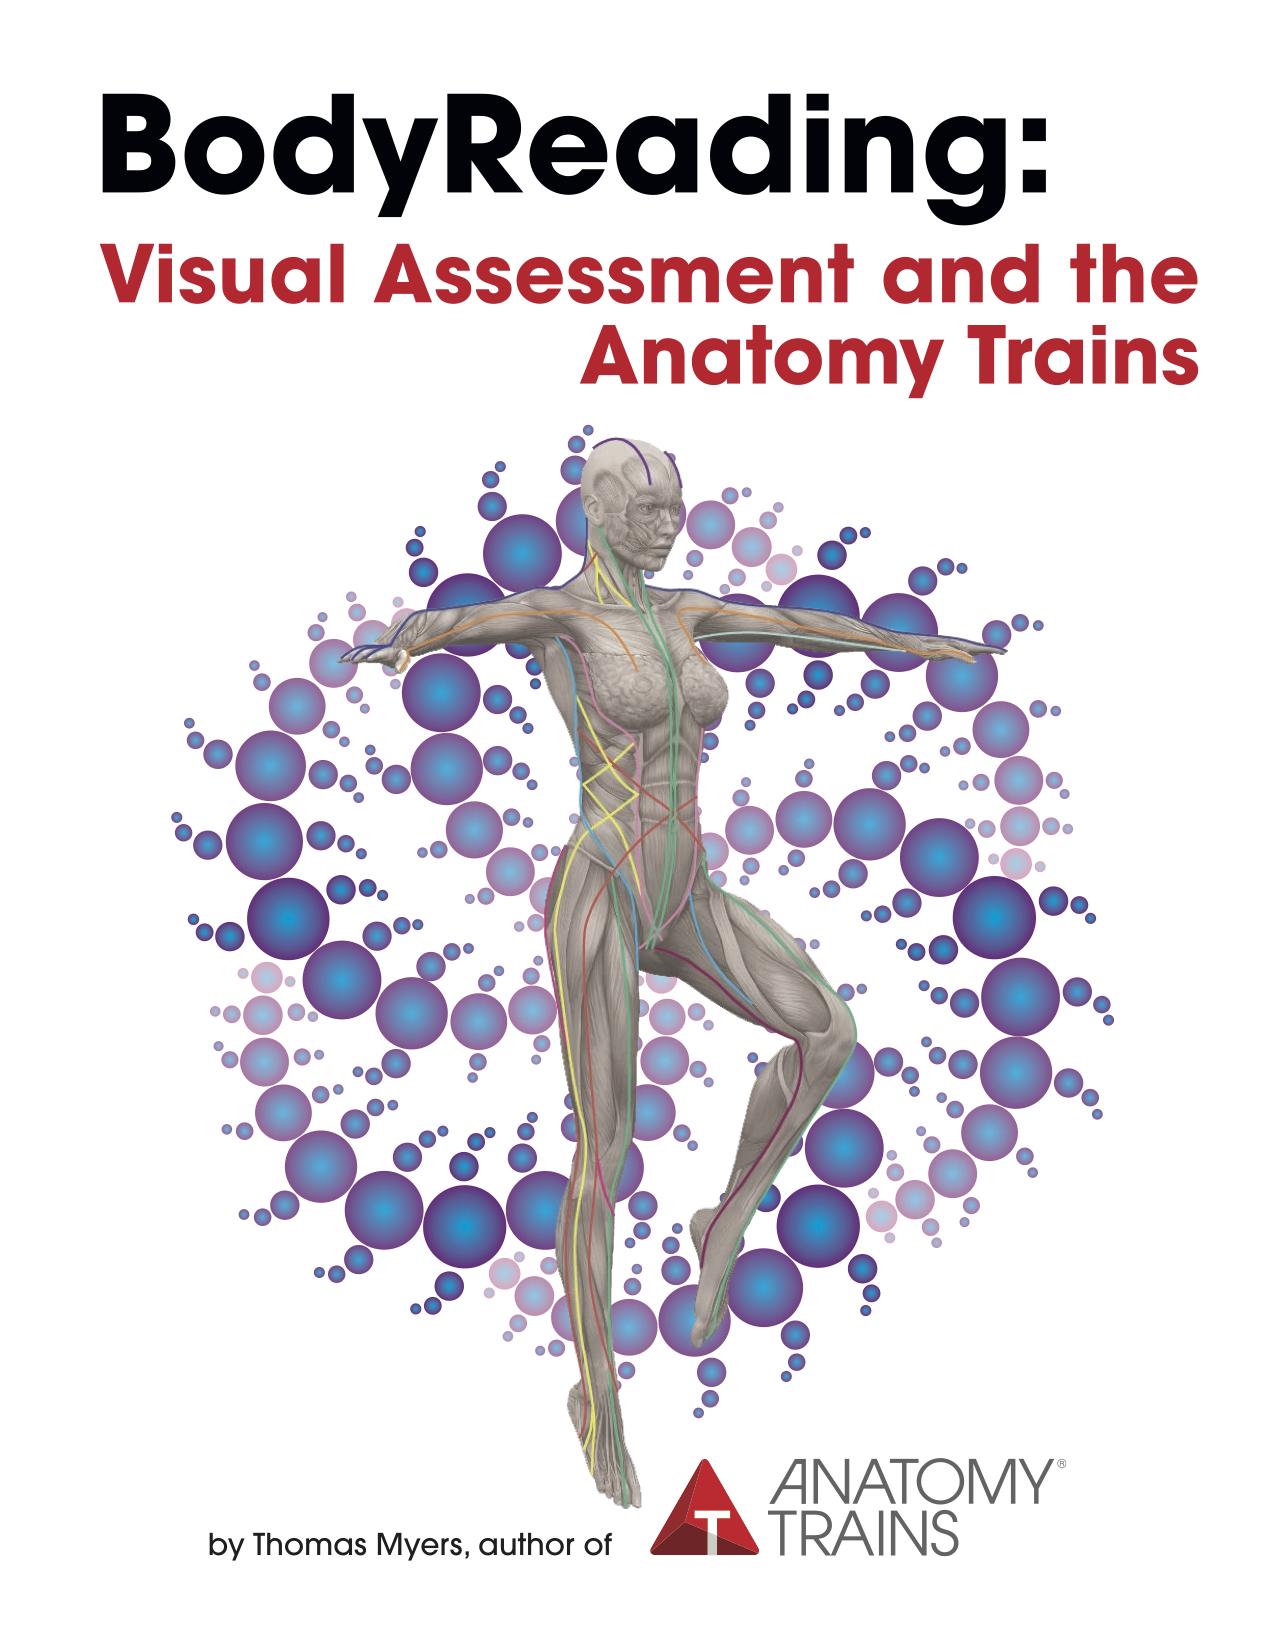 Anatomy trains thomas myers